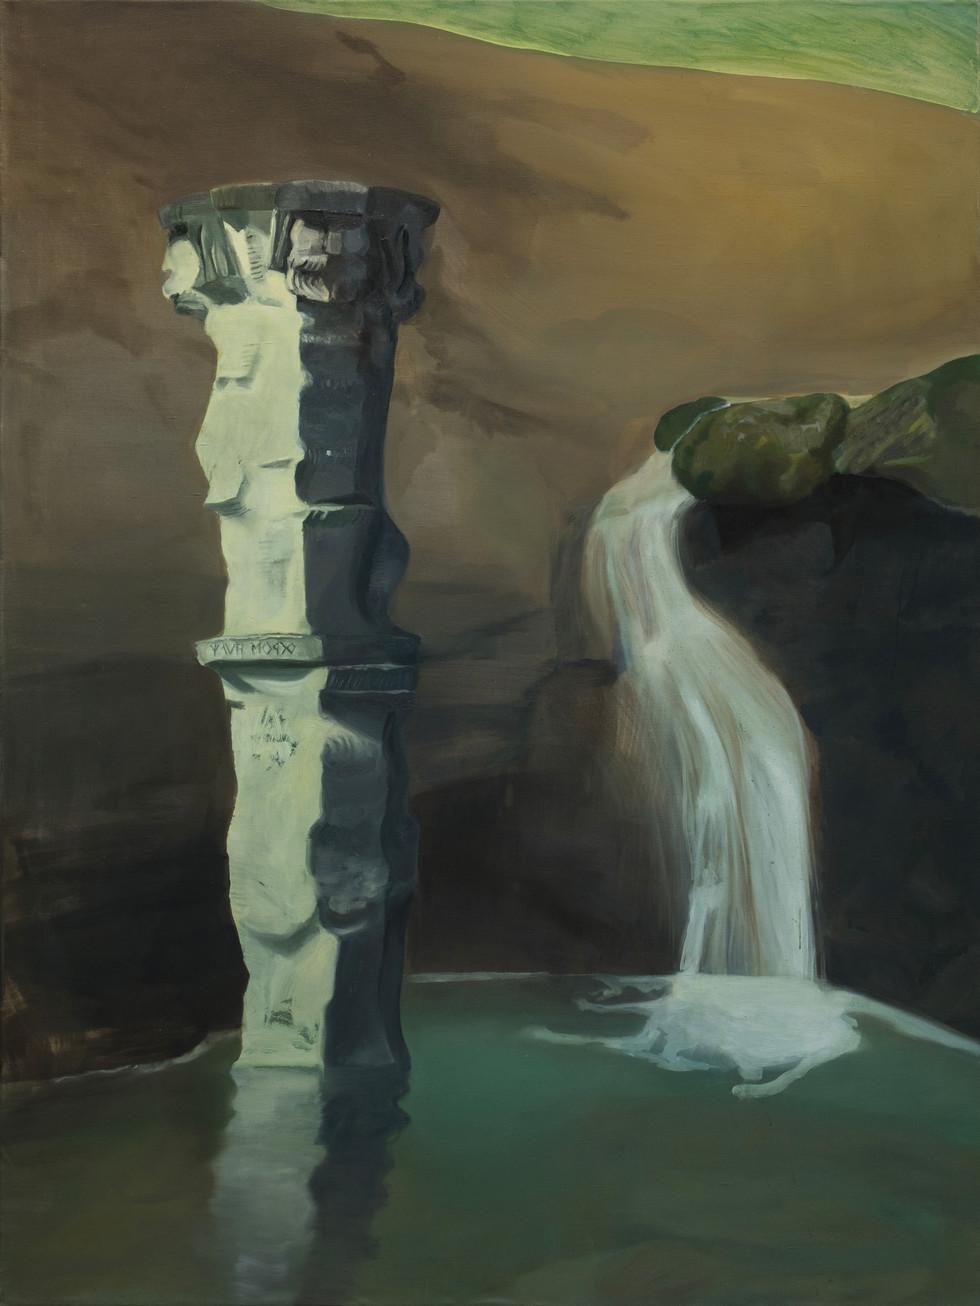 Qui sorge (Trumusiate), 2020, oil on linen, 200x150 cm